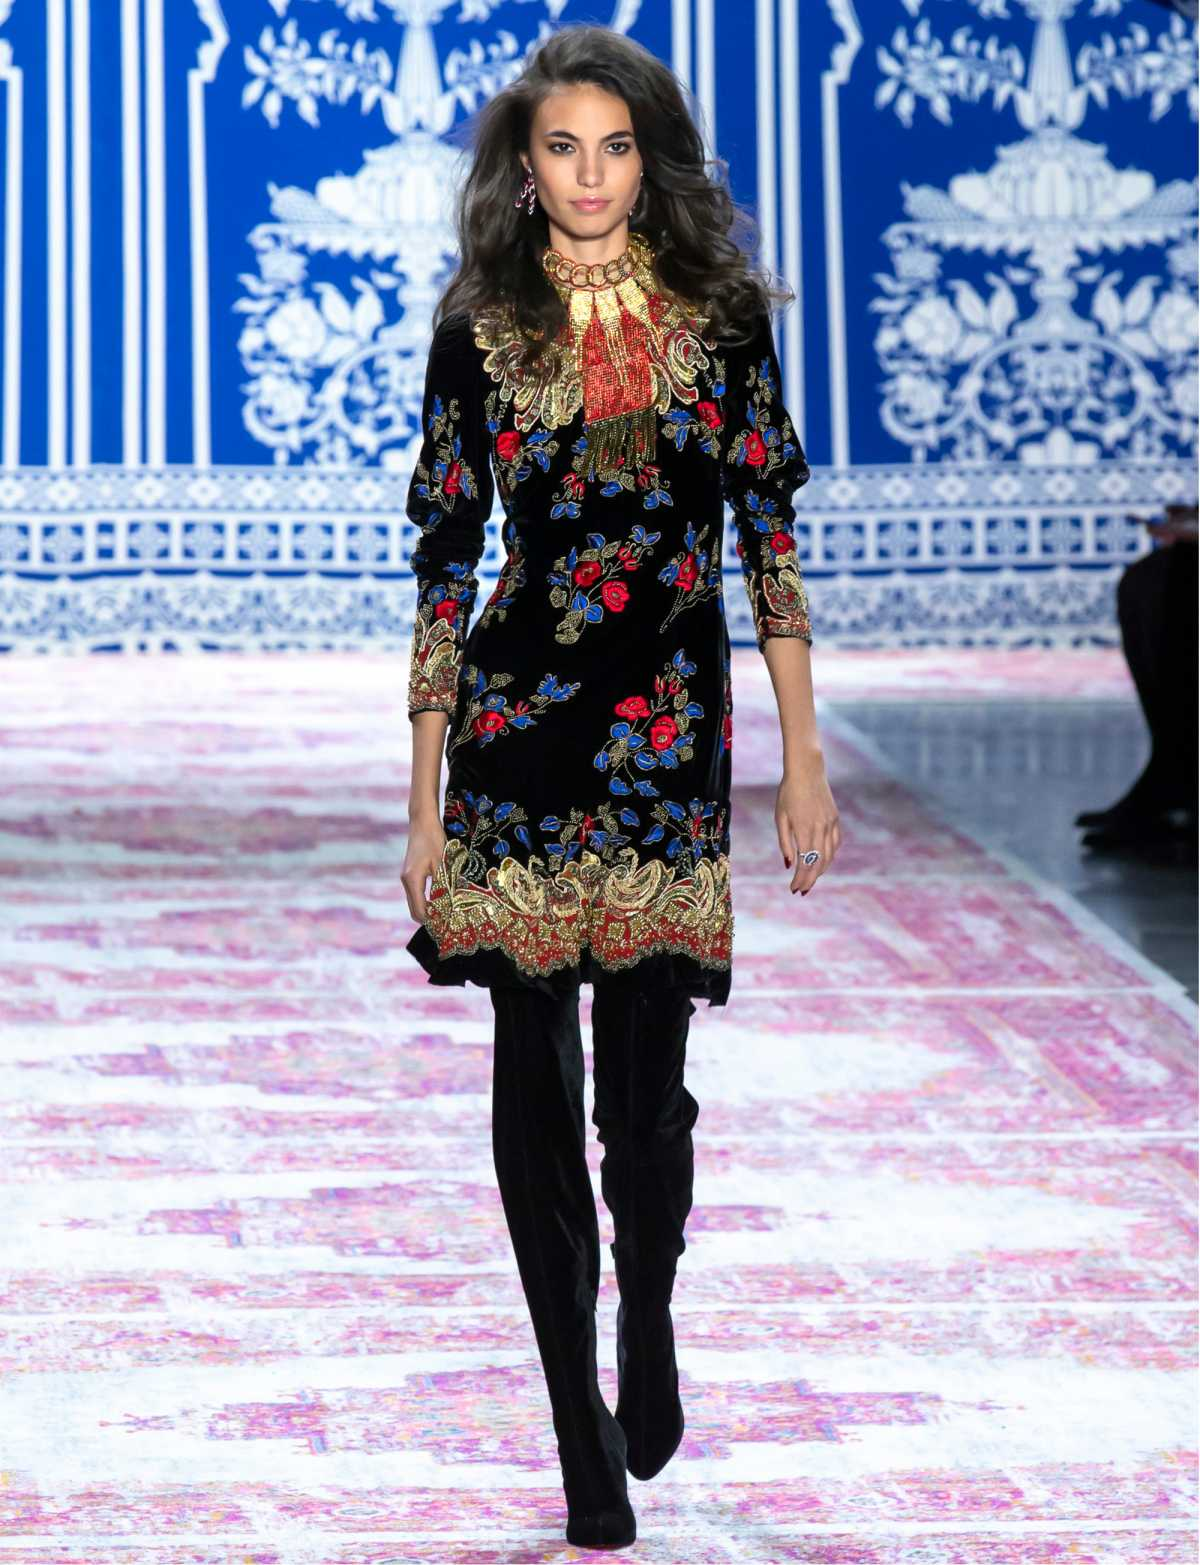 vestido floral e botas chique